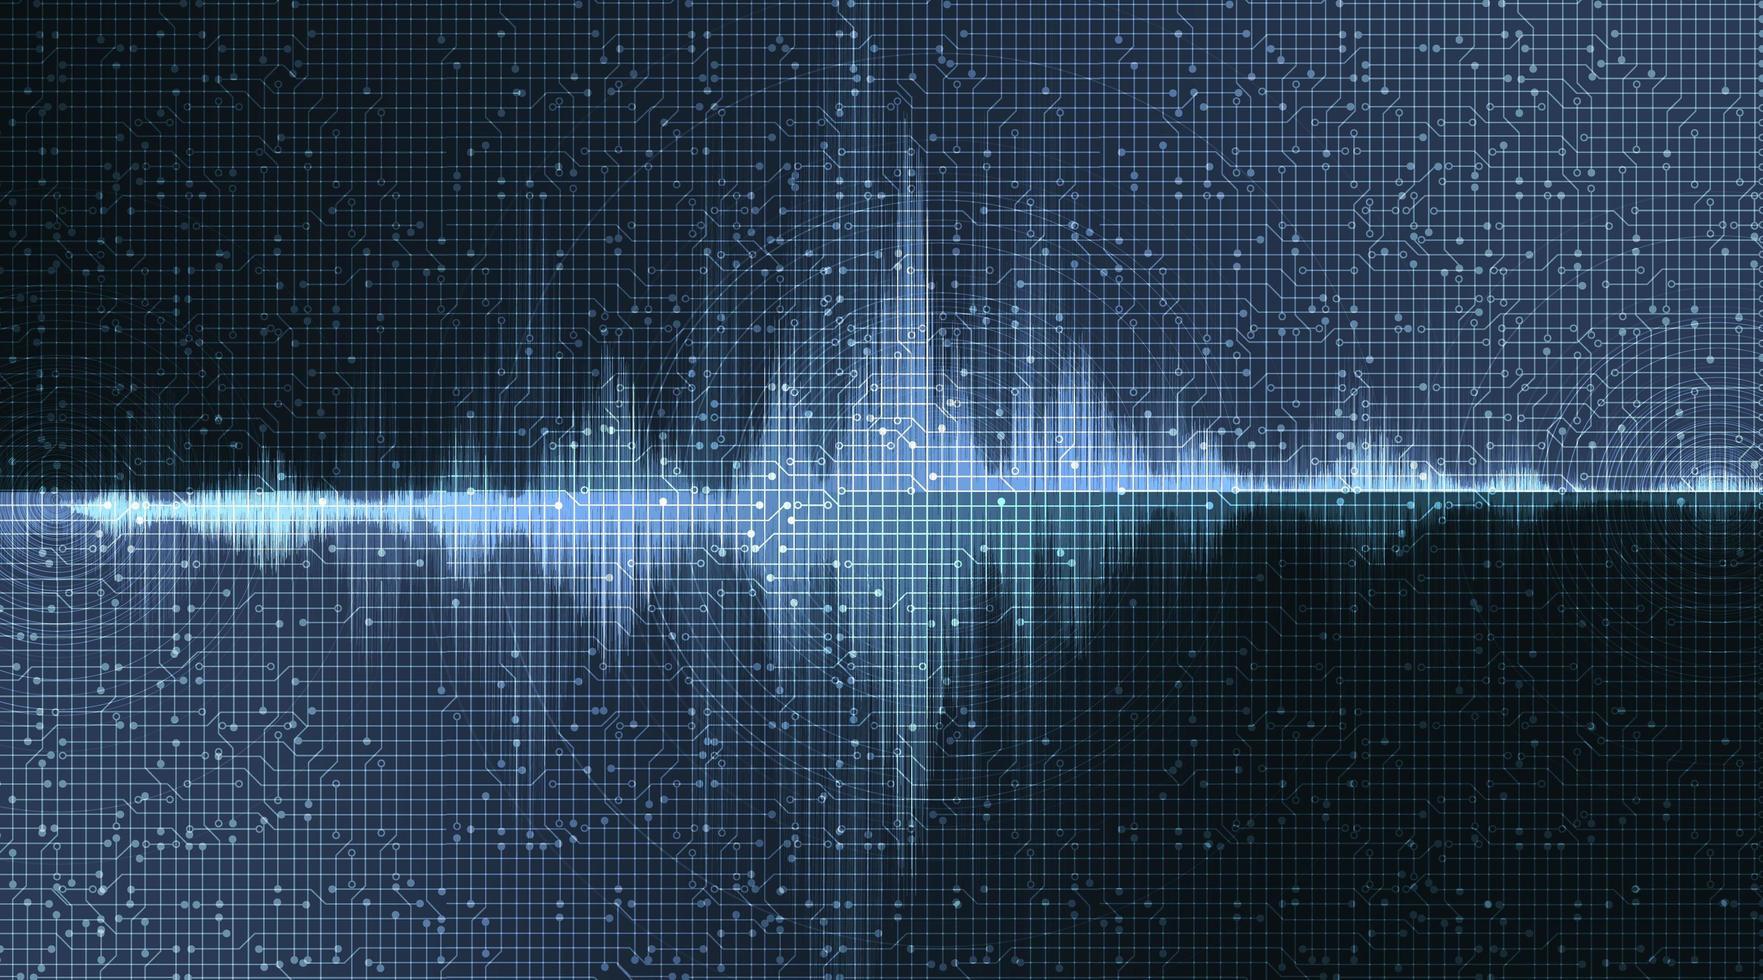 digitale geluidsgolf op donkerblauwe achtergrond, technologie en aardbevingsgolfdiagramconcept vector